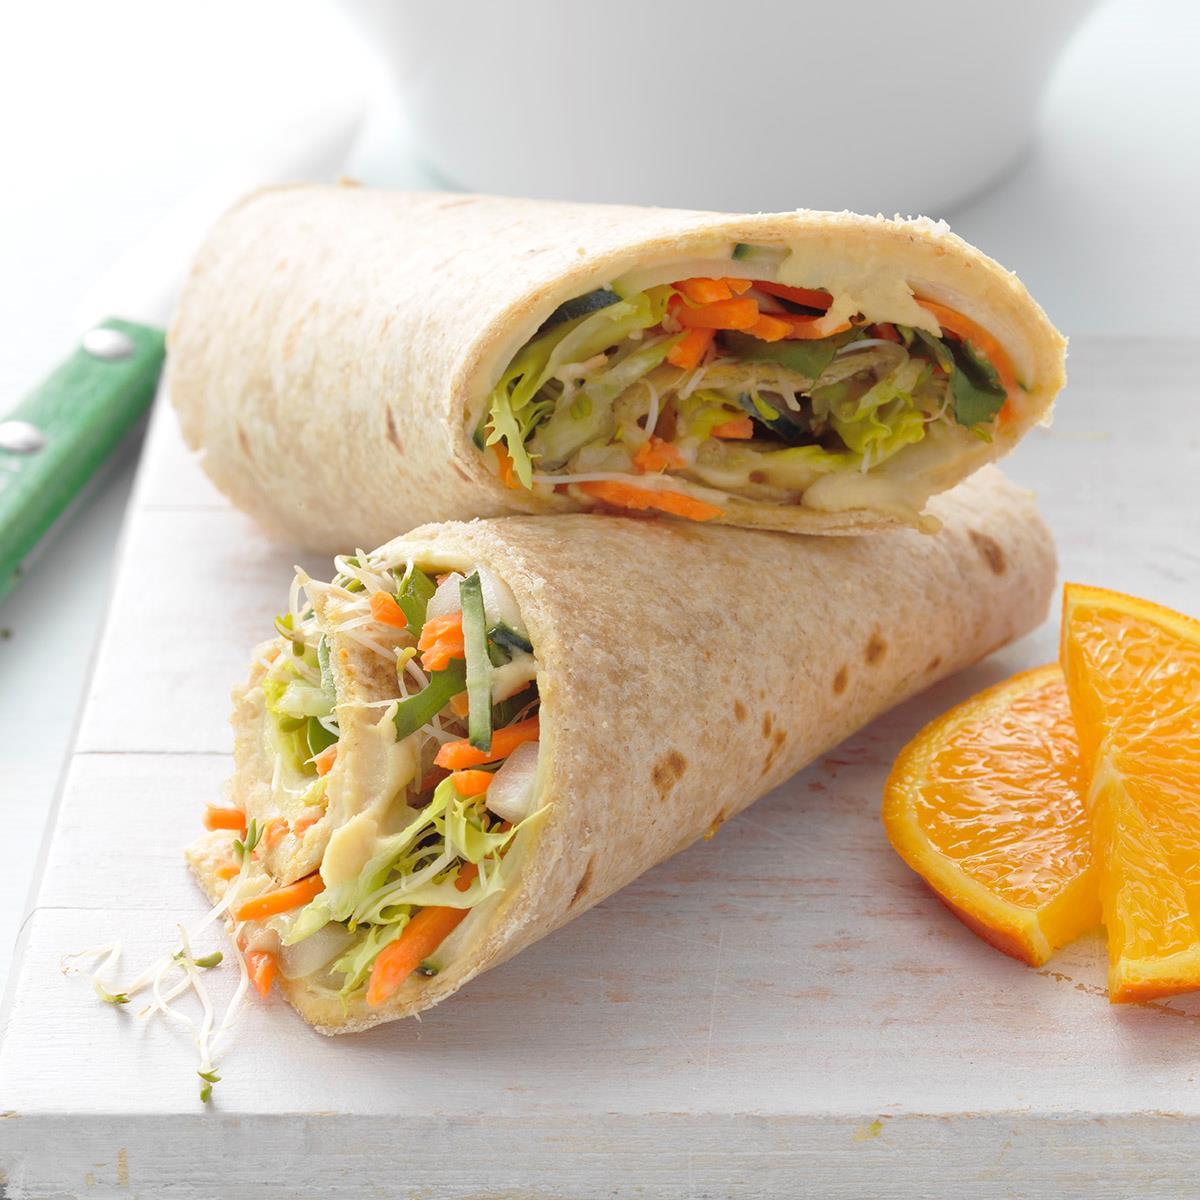 Hummus & Veggie Wrap-Up Recipe: How to Make It   Taste of Home